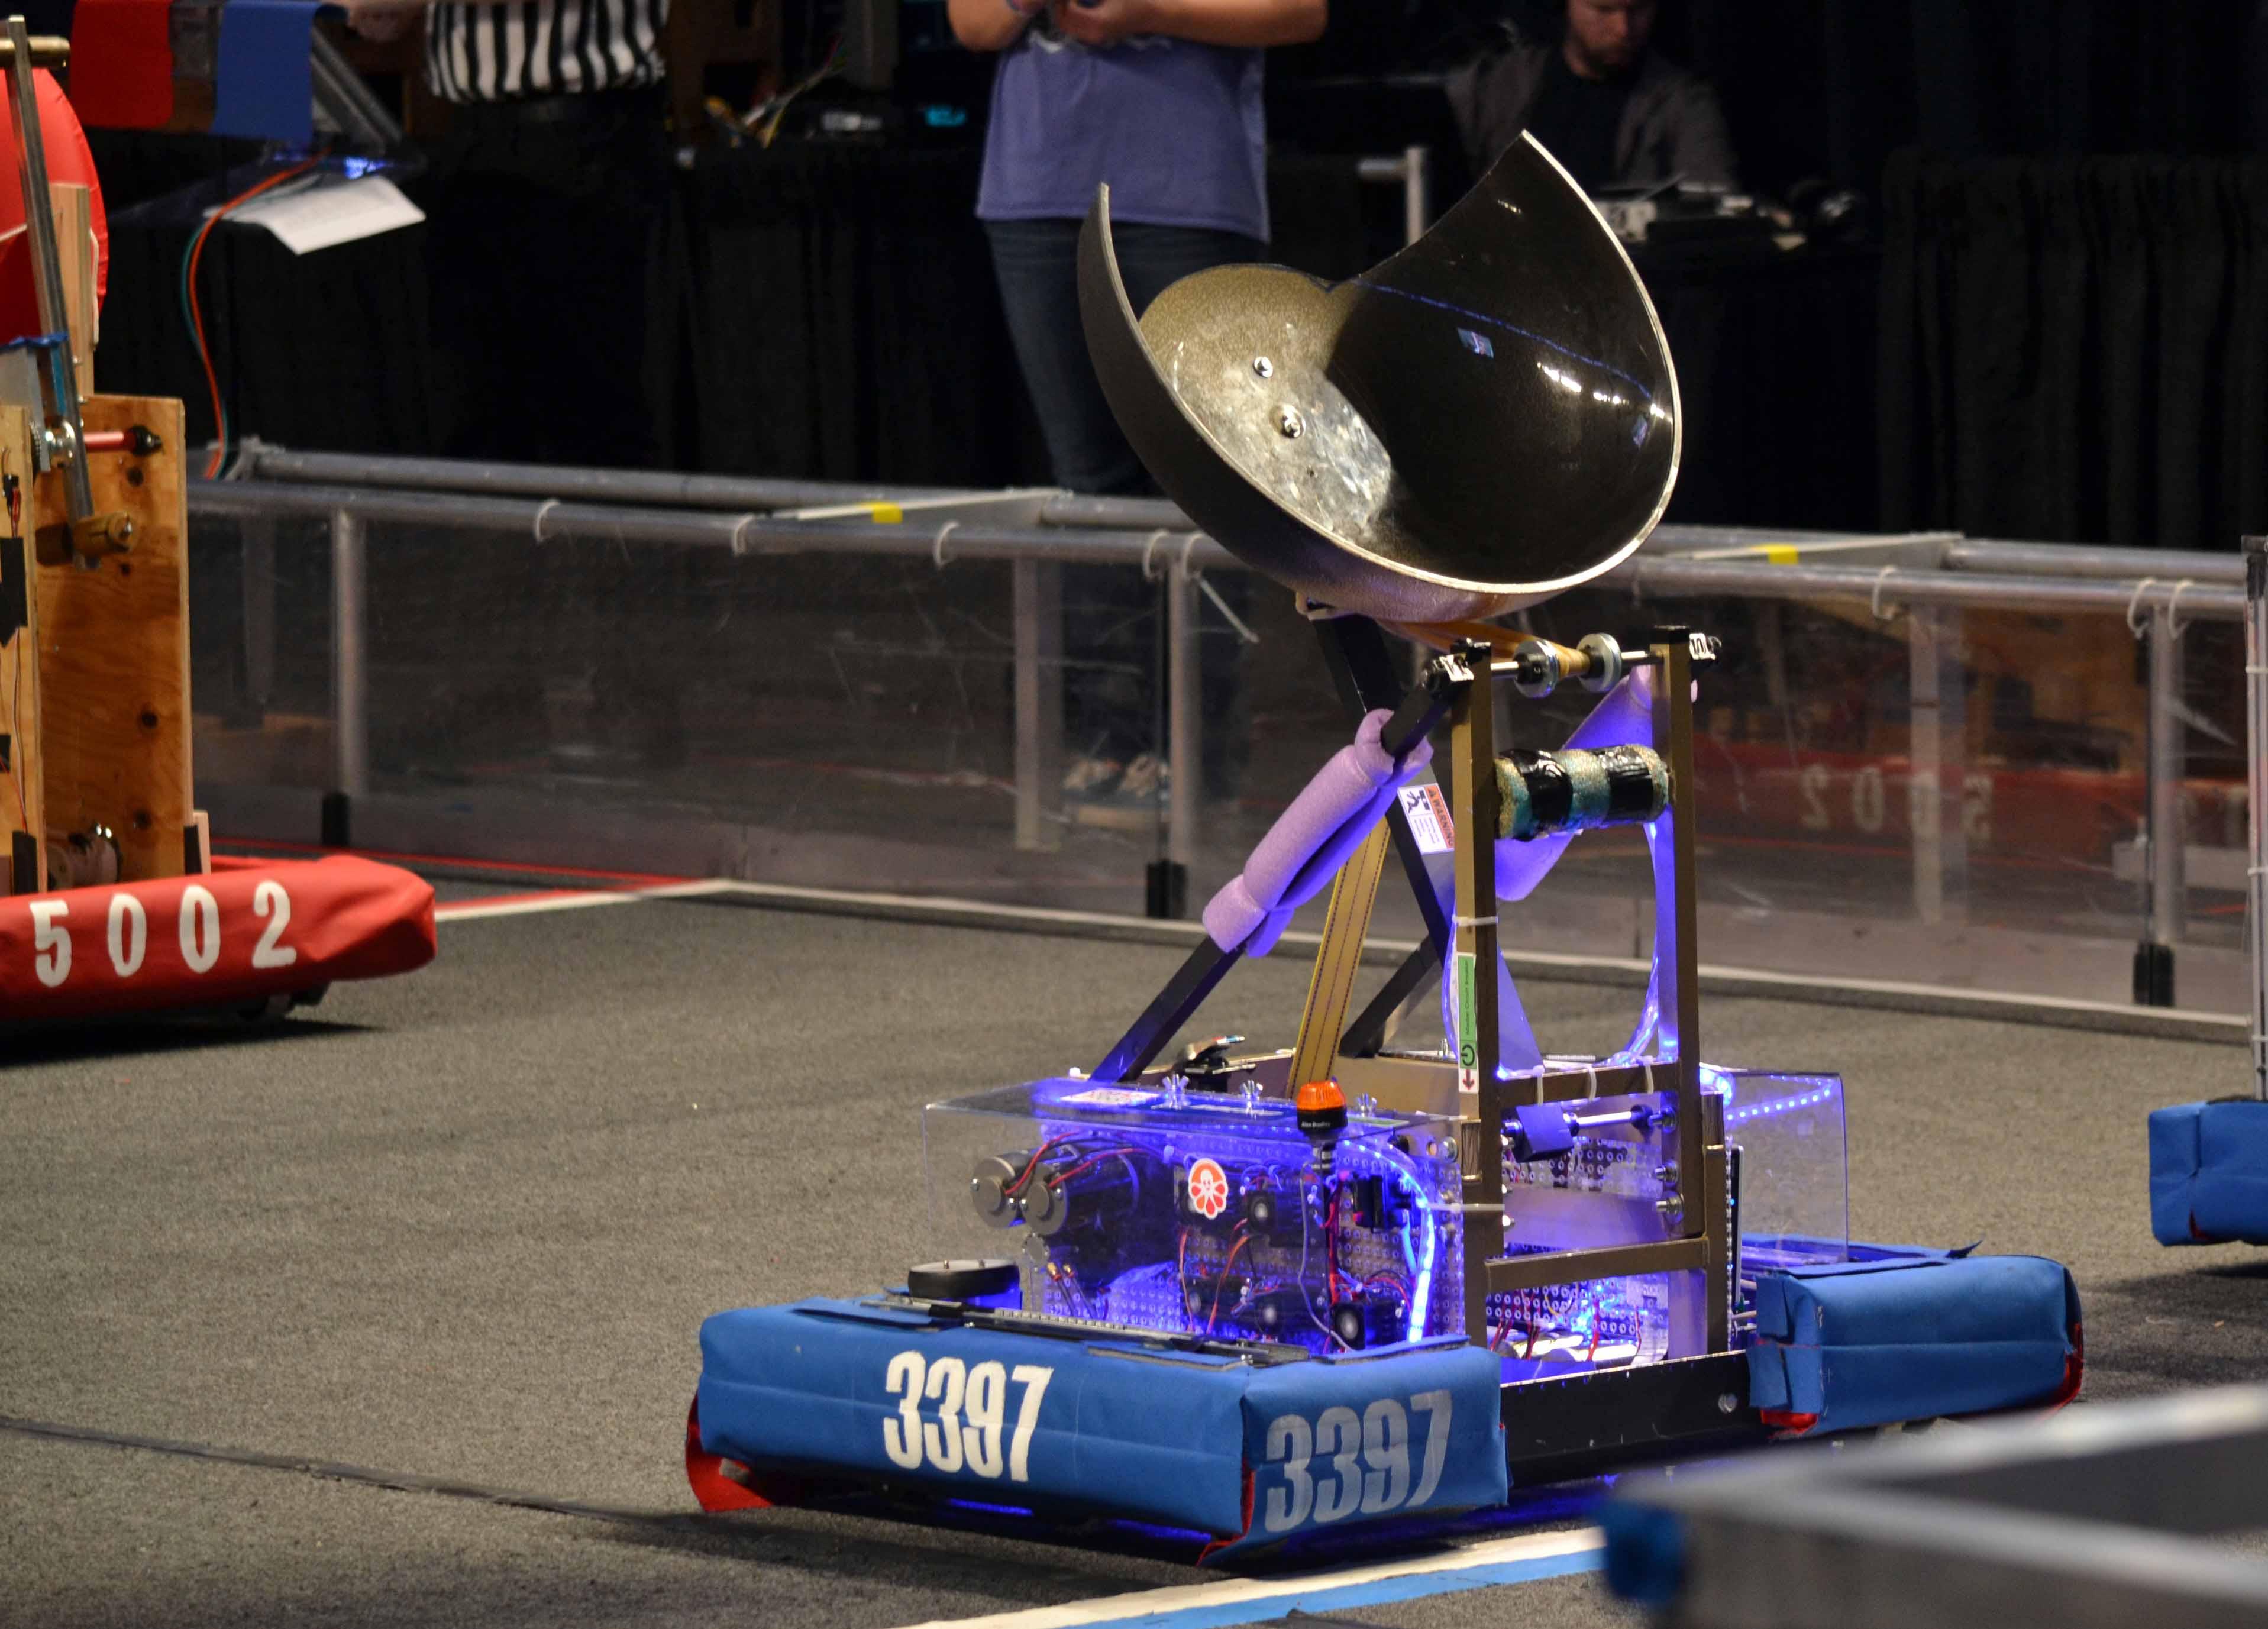 Ulysses, the Robolions' robot.